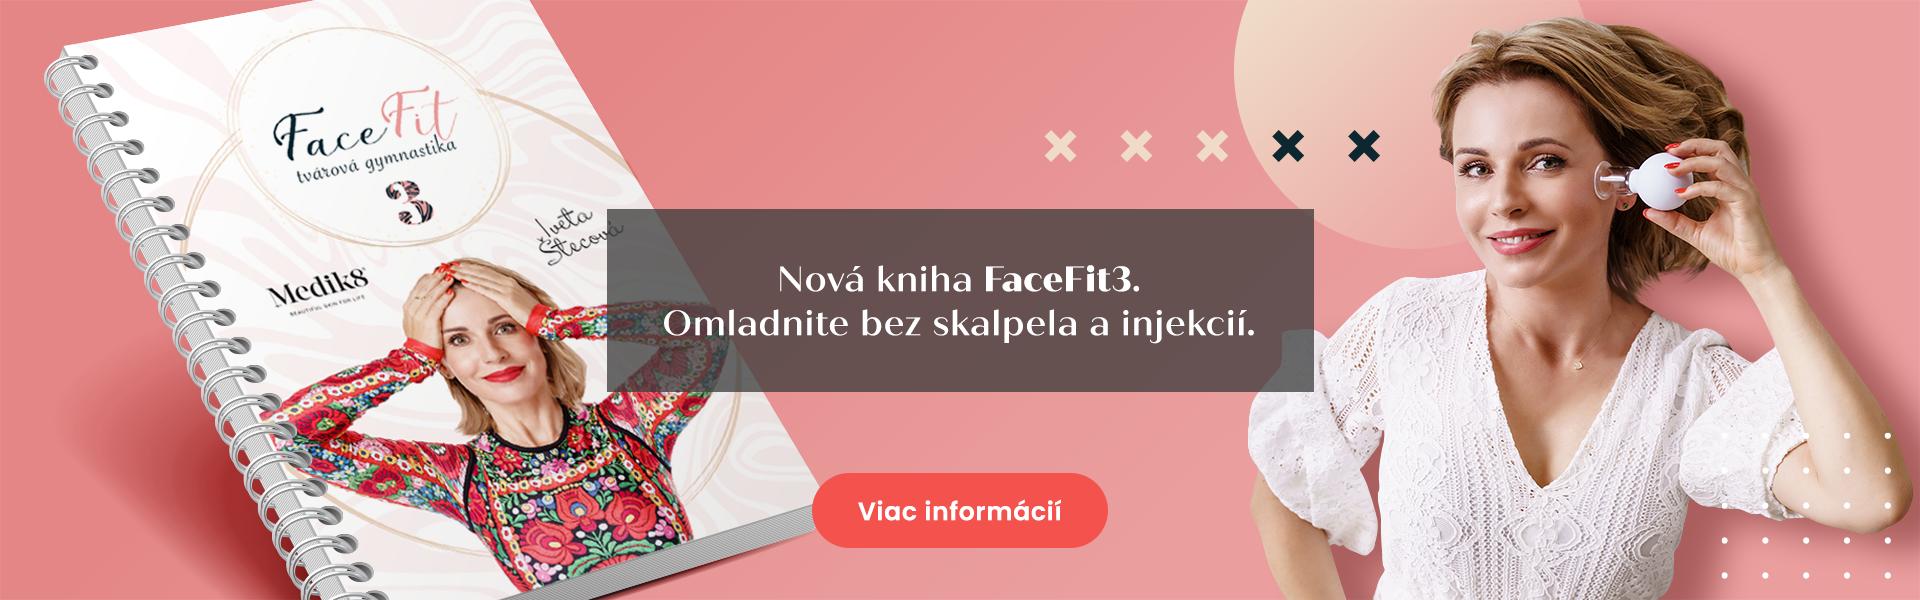 Facefit-3